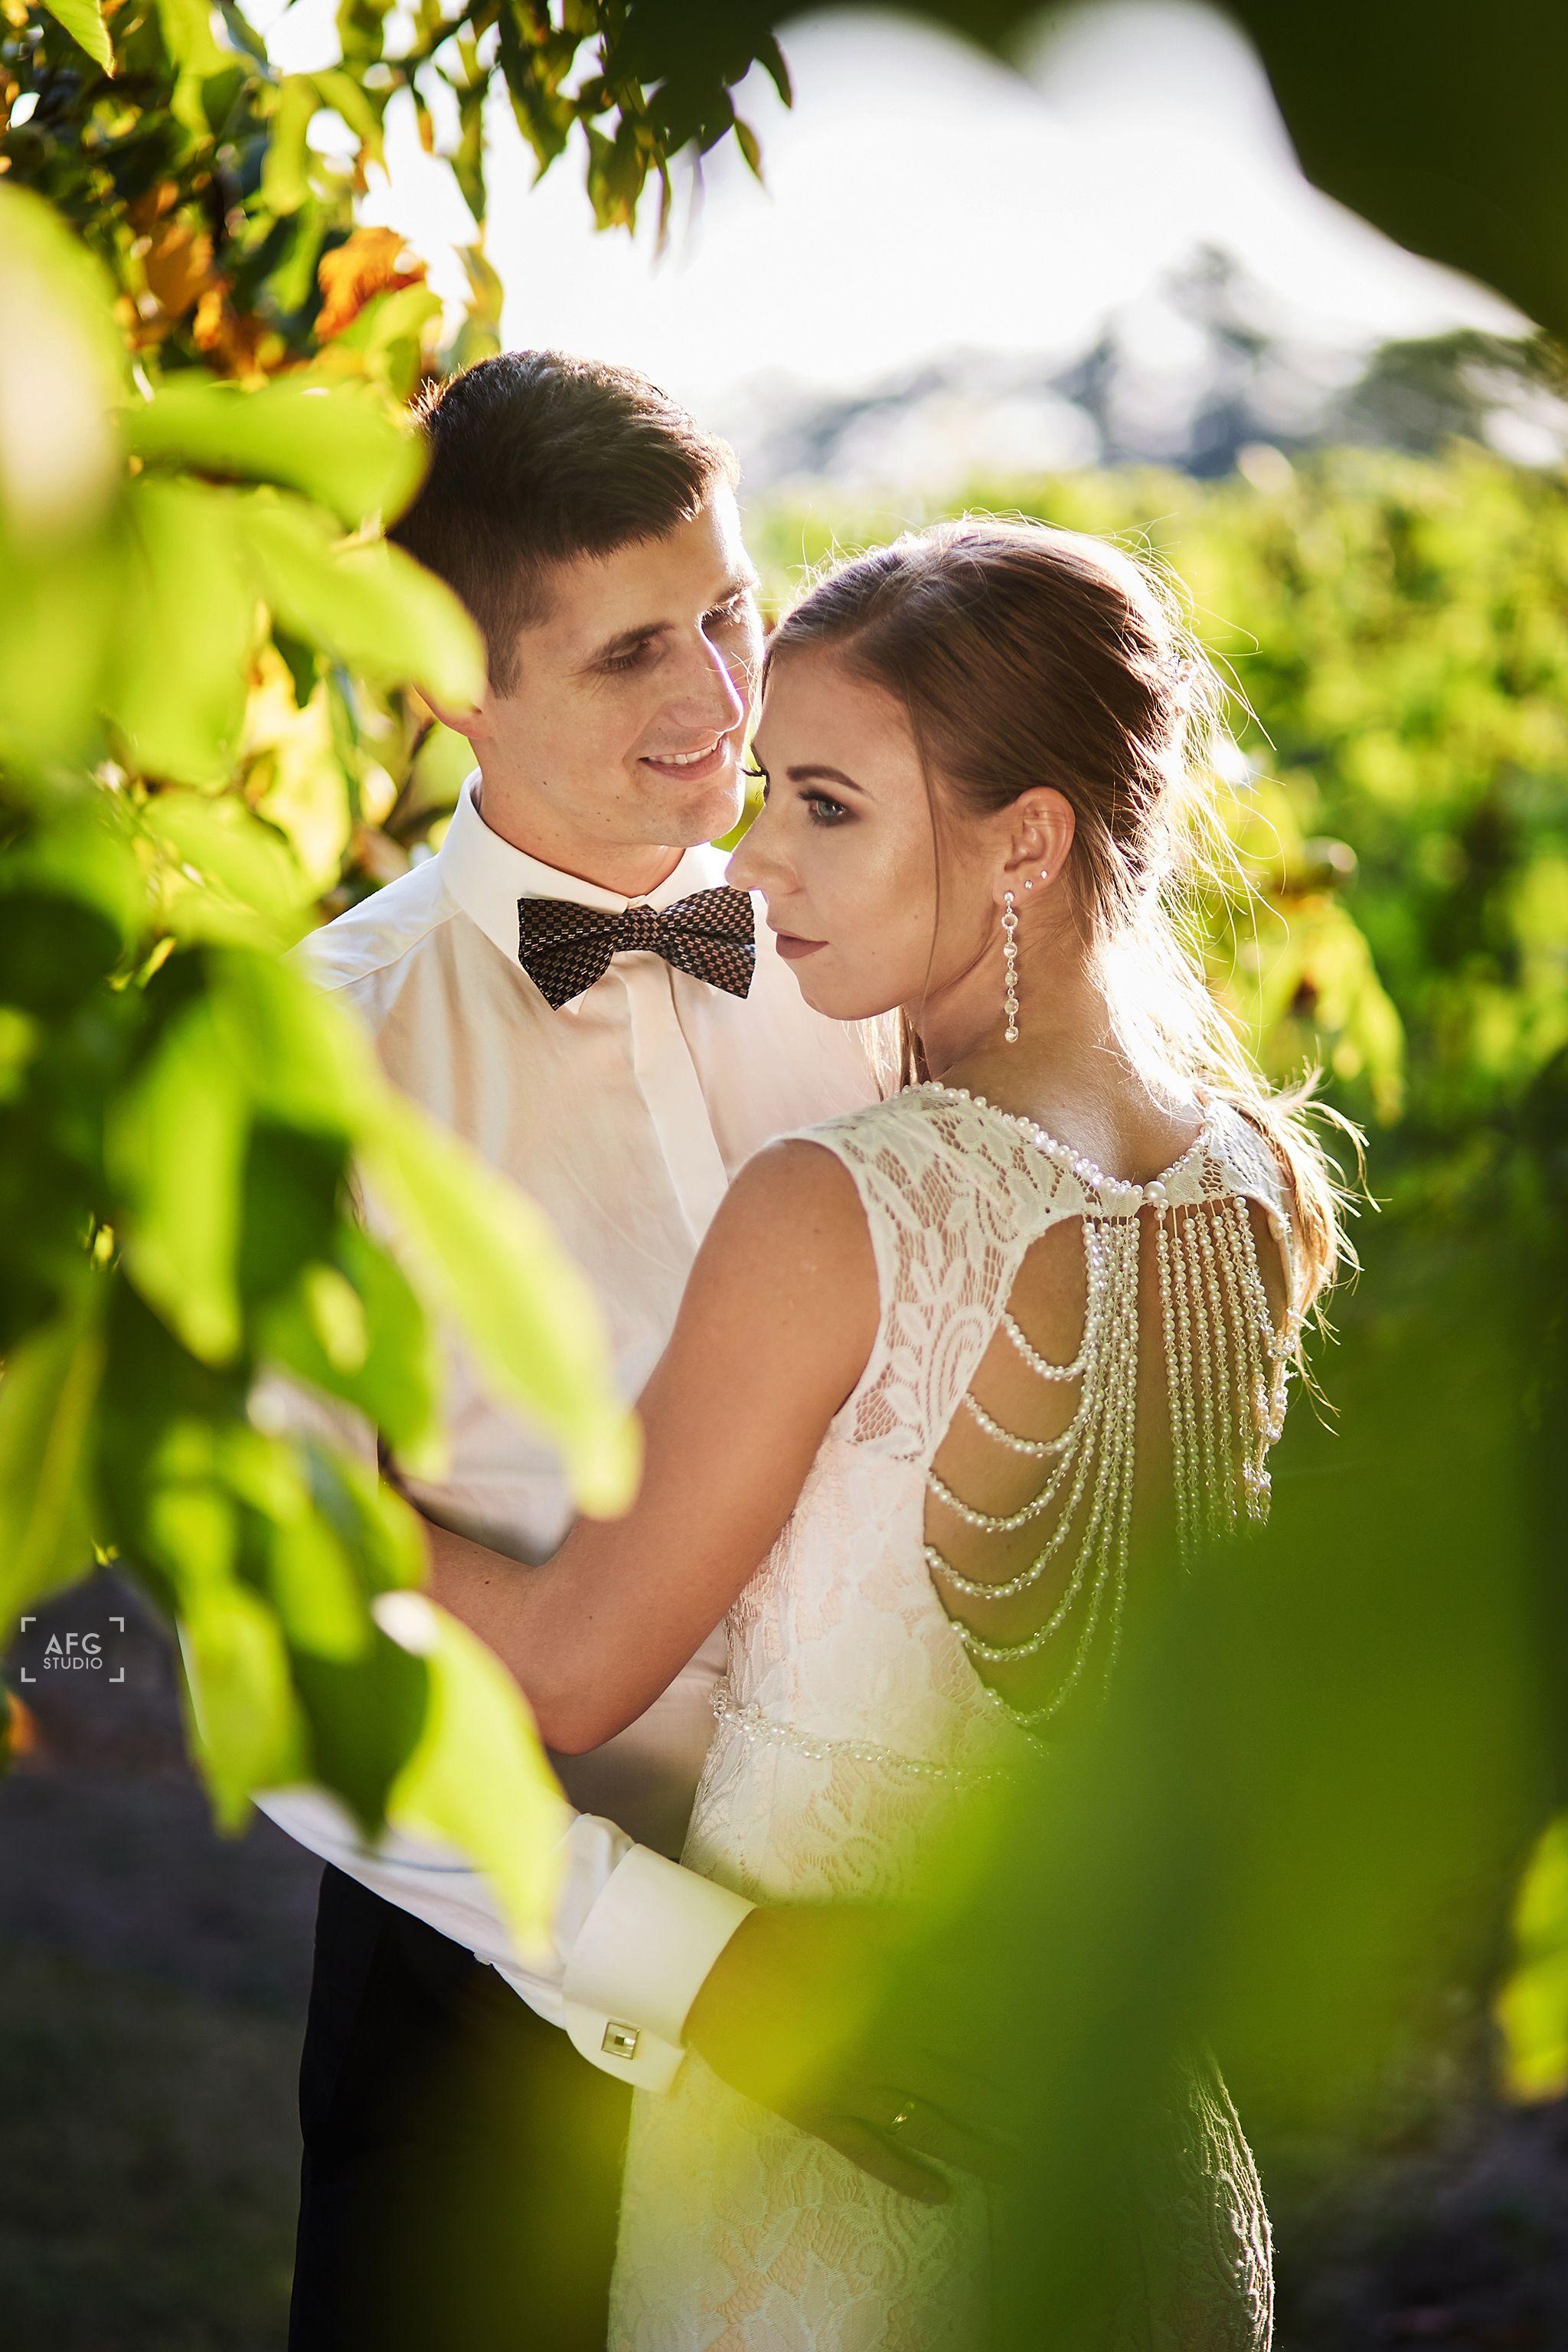 suknia ślubna, pan młody, winnica